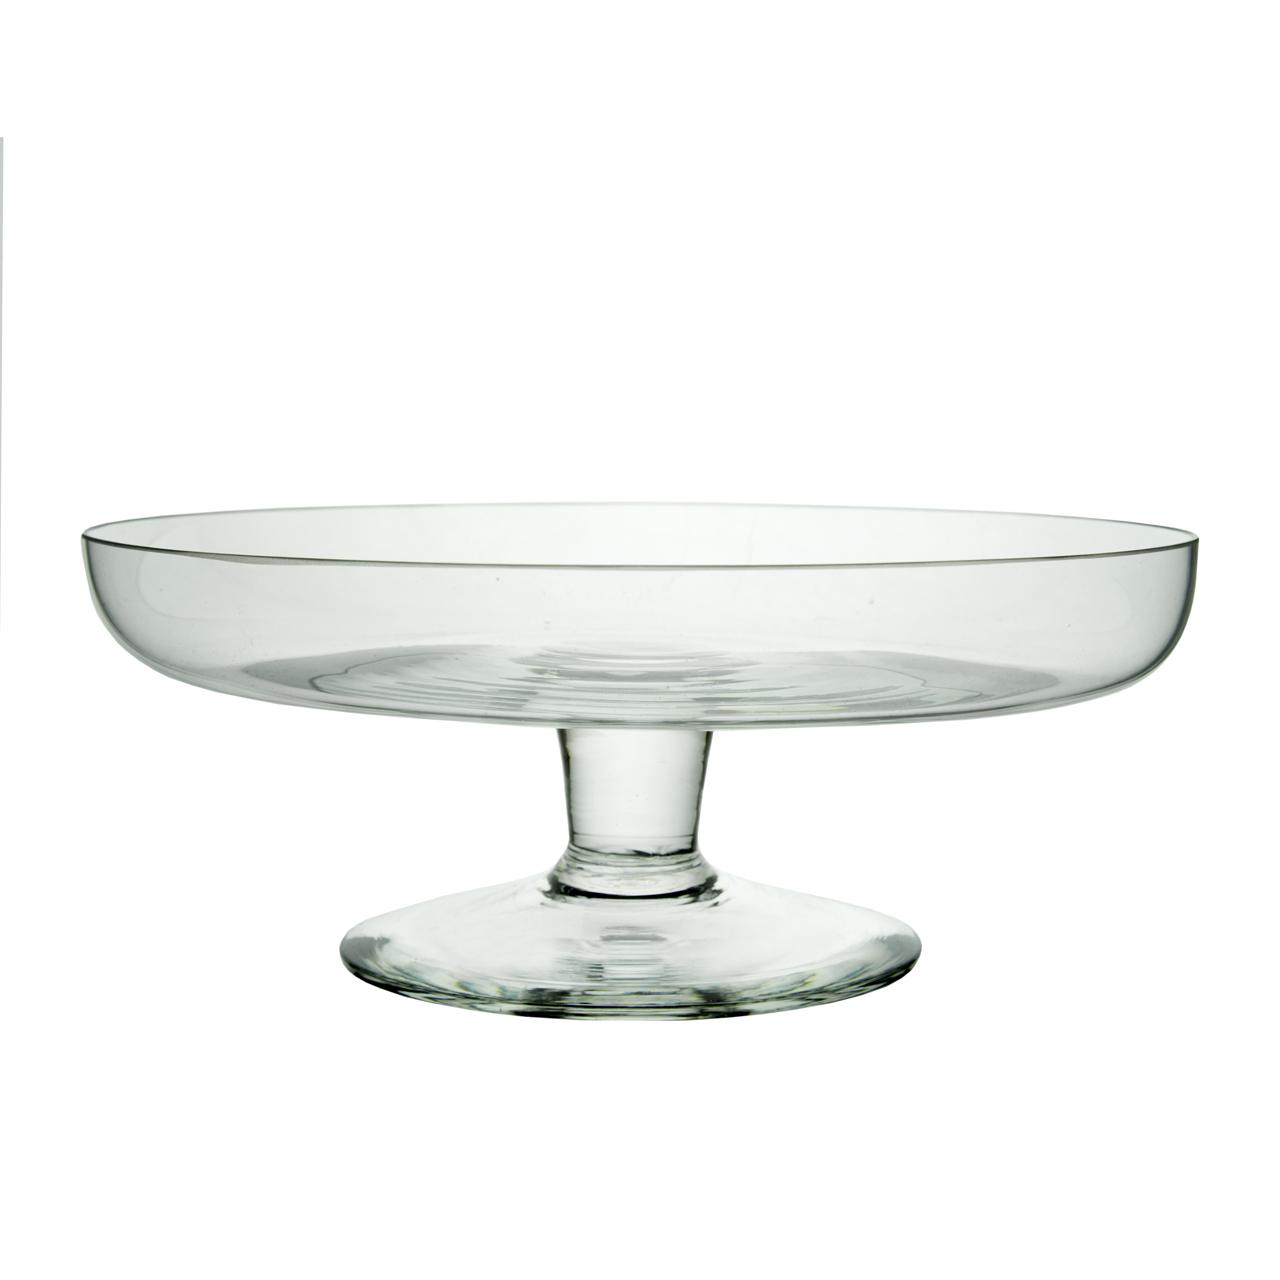 Platou Cu Picior Din Sticla 25 Cm